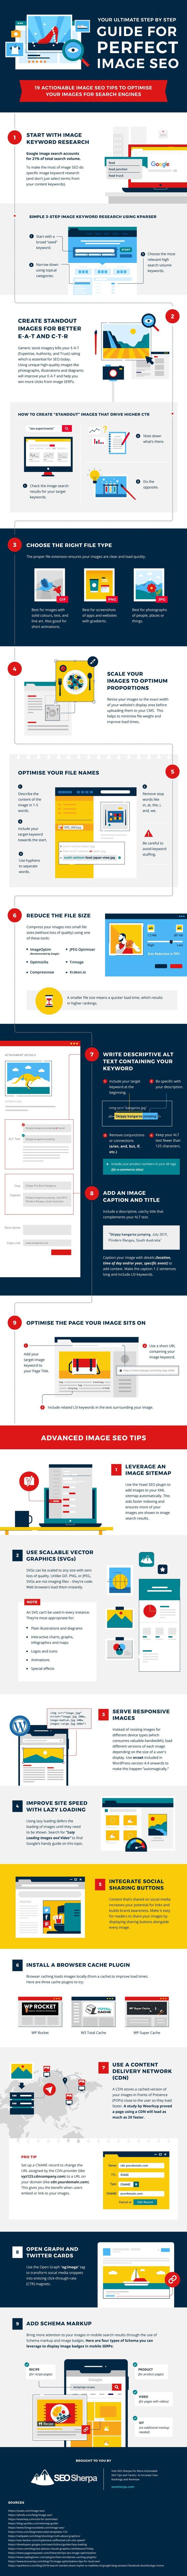 Infografía sobre optimización de imágenes